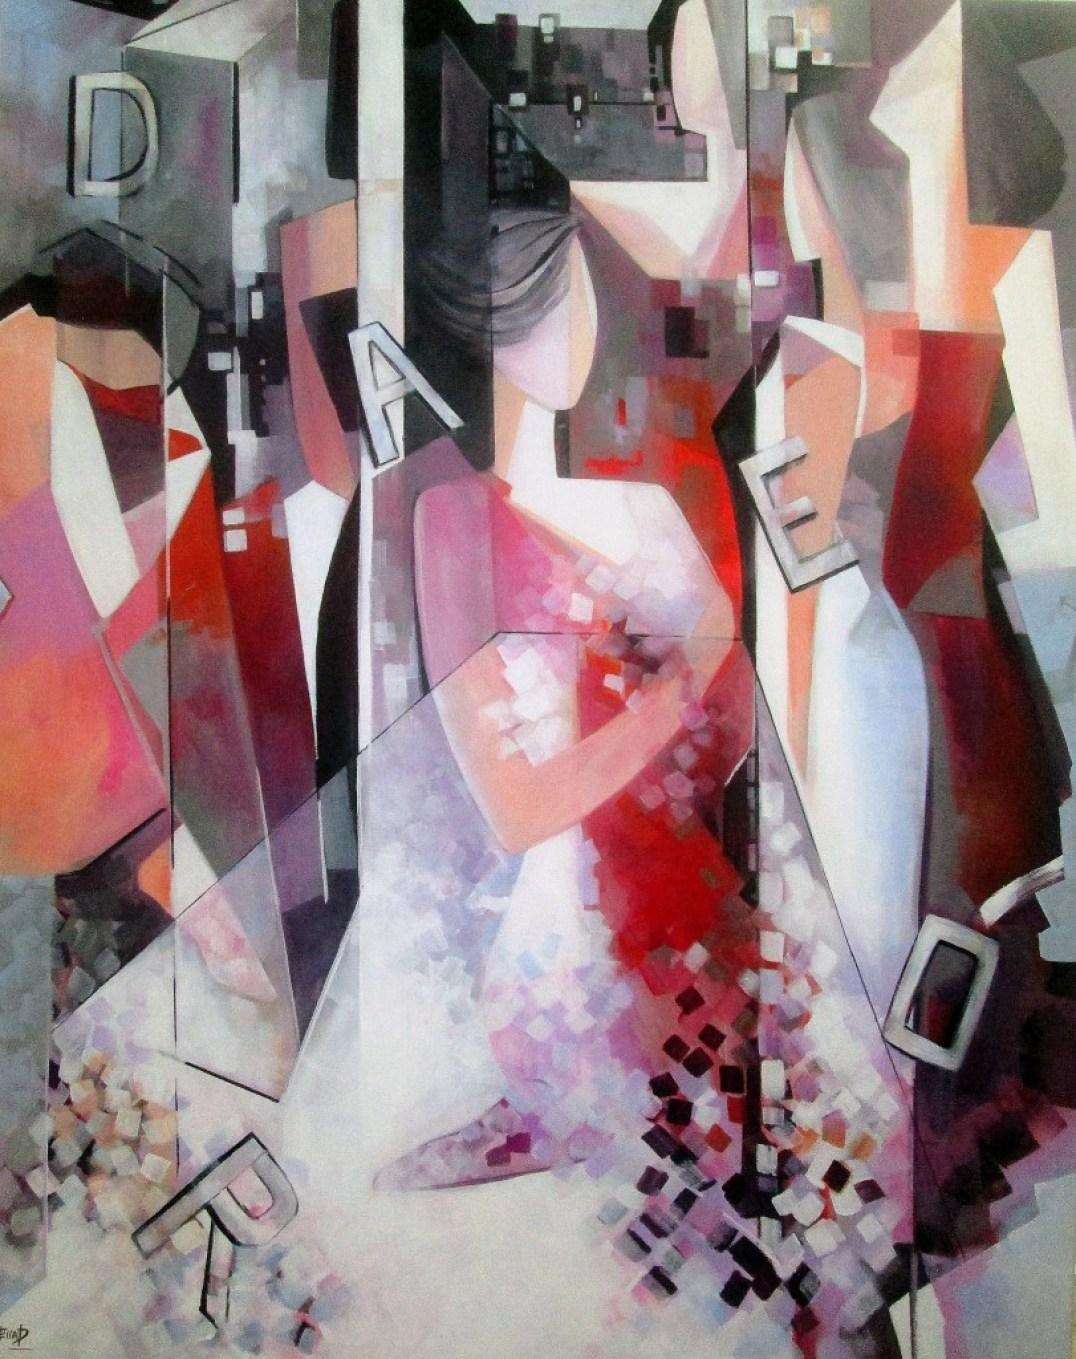 Adore 130 x 100 cm Acrylic on canvas